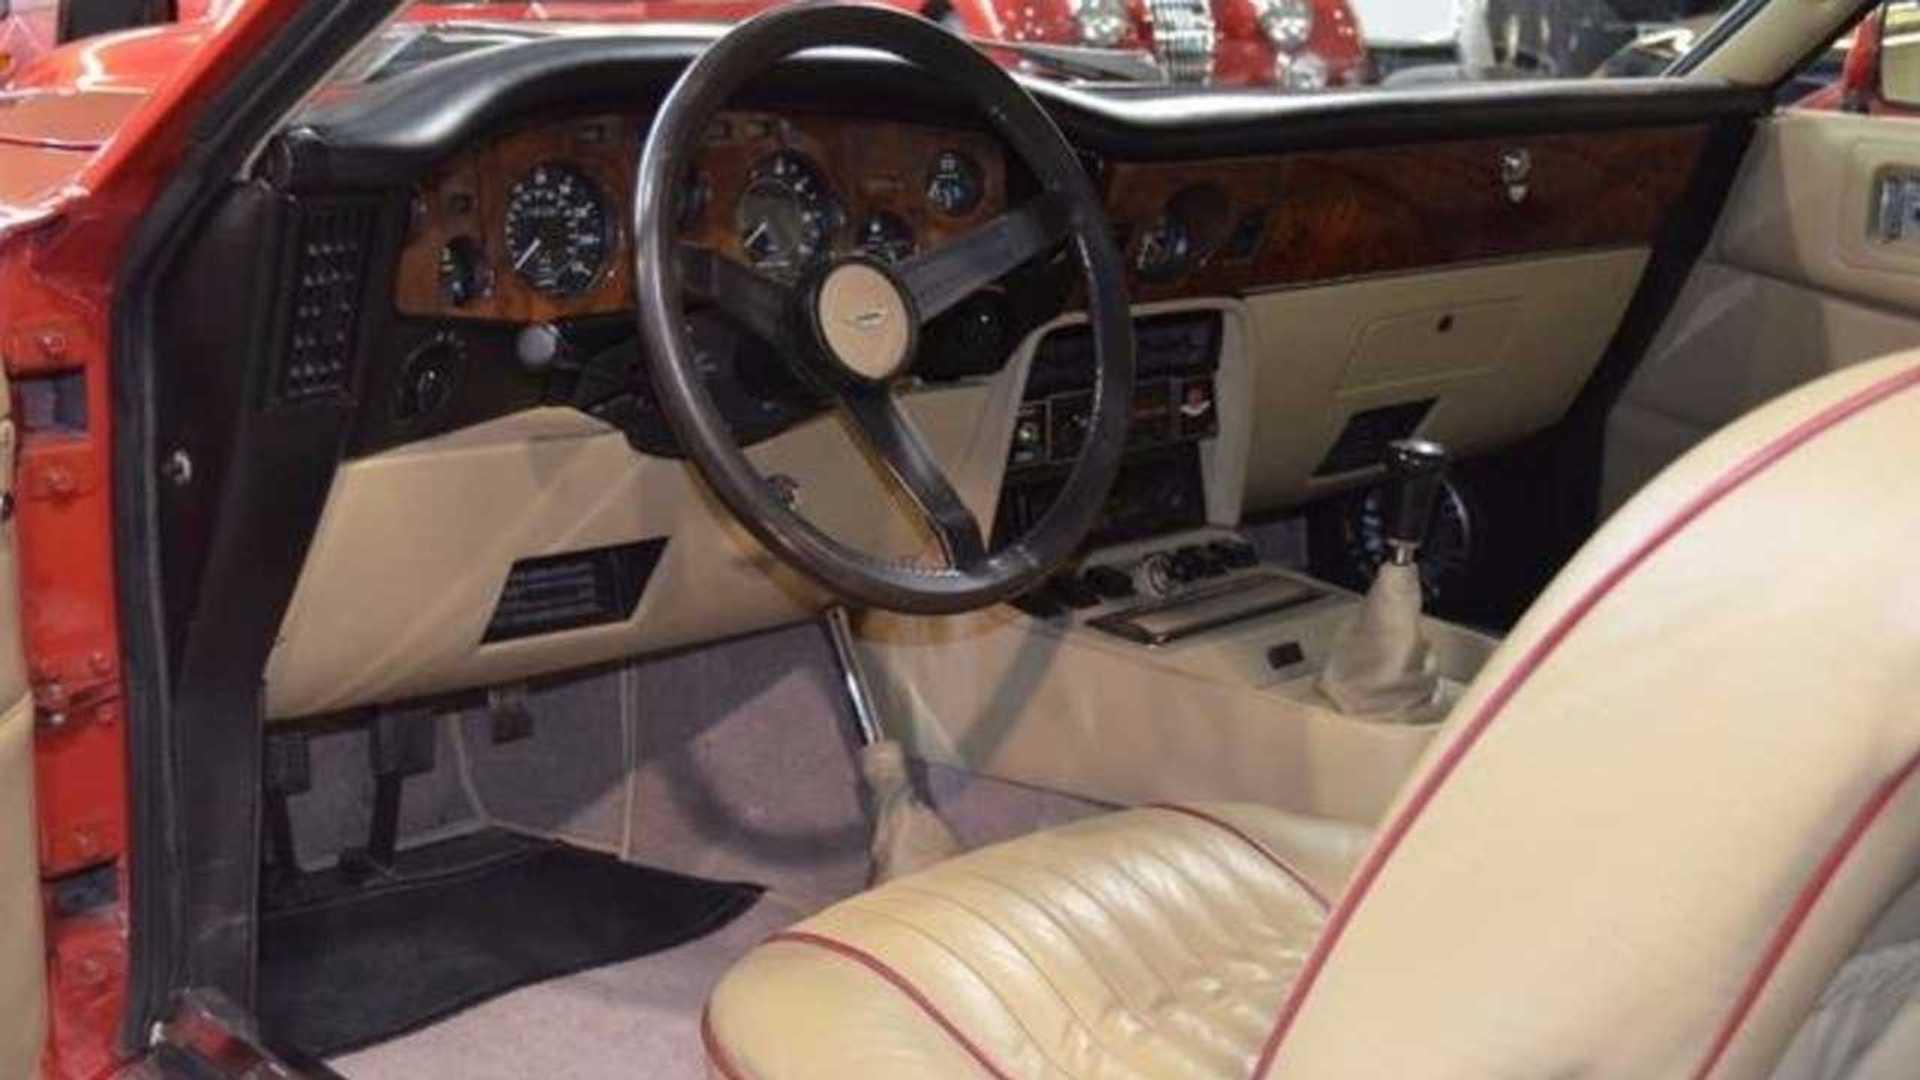 Brutal 1978 Aston Martin V8 Vantage Was Britain S First Supercar